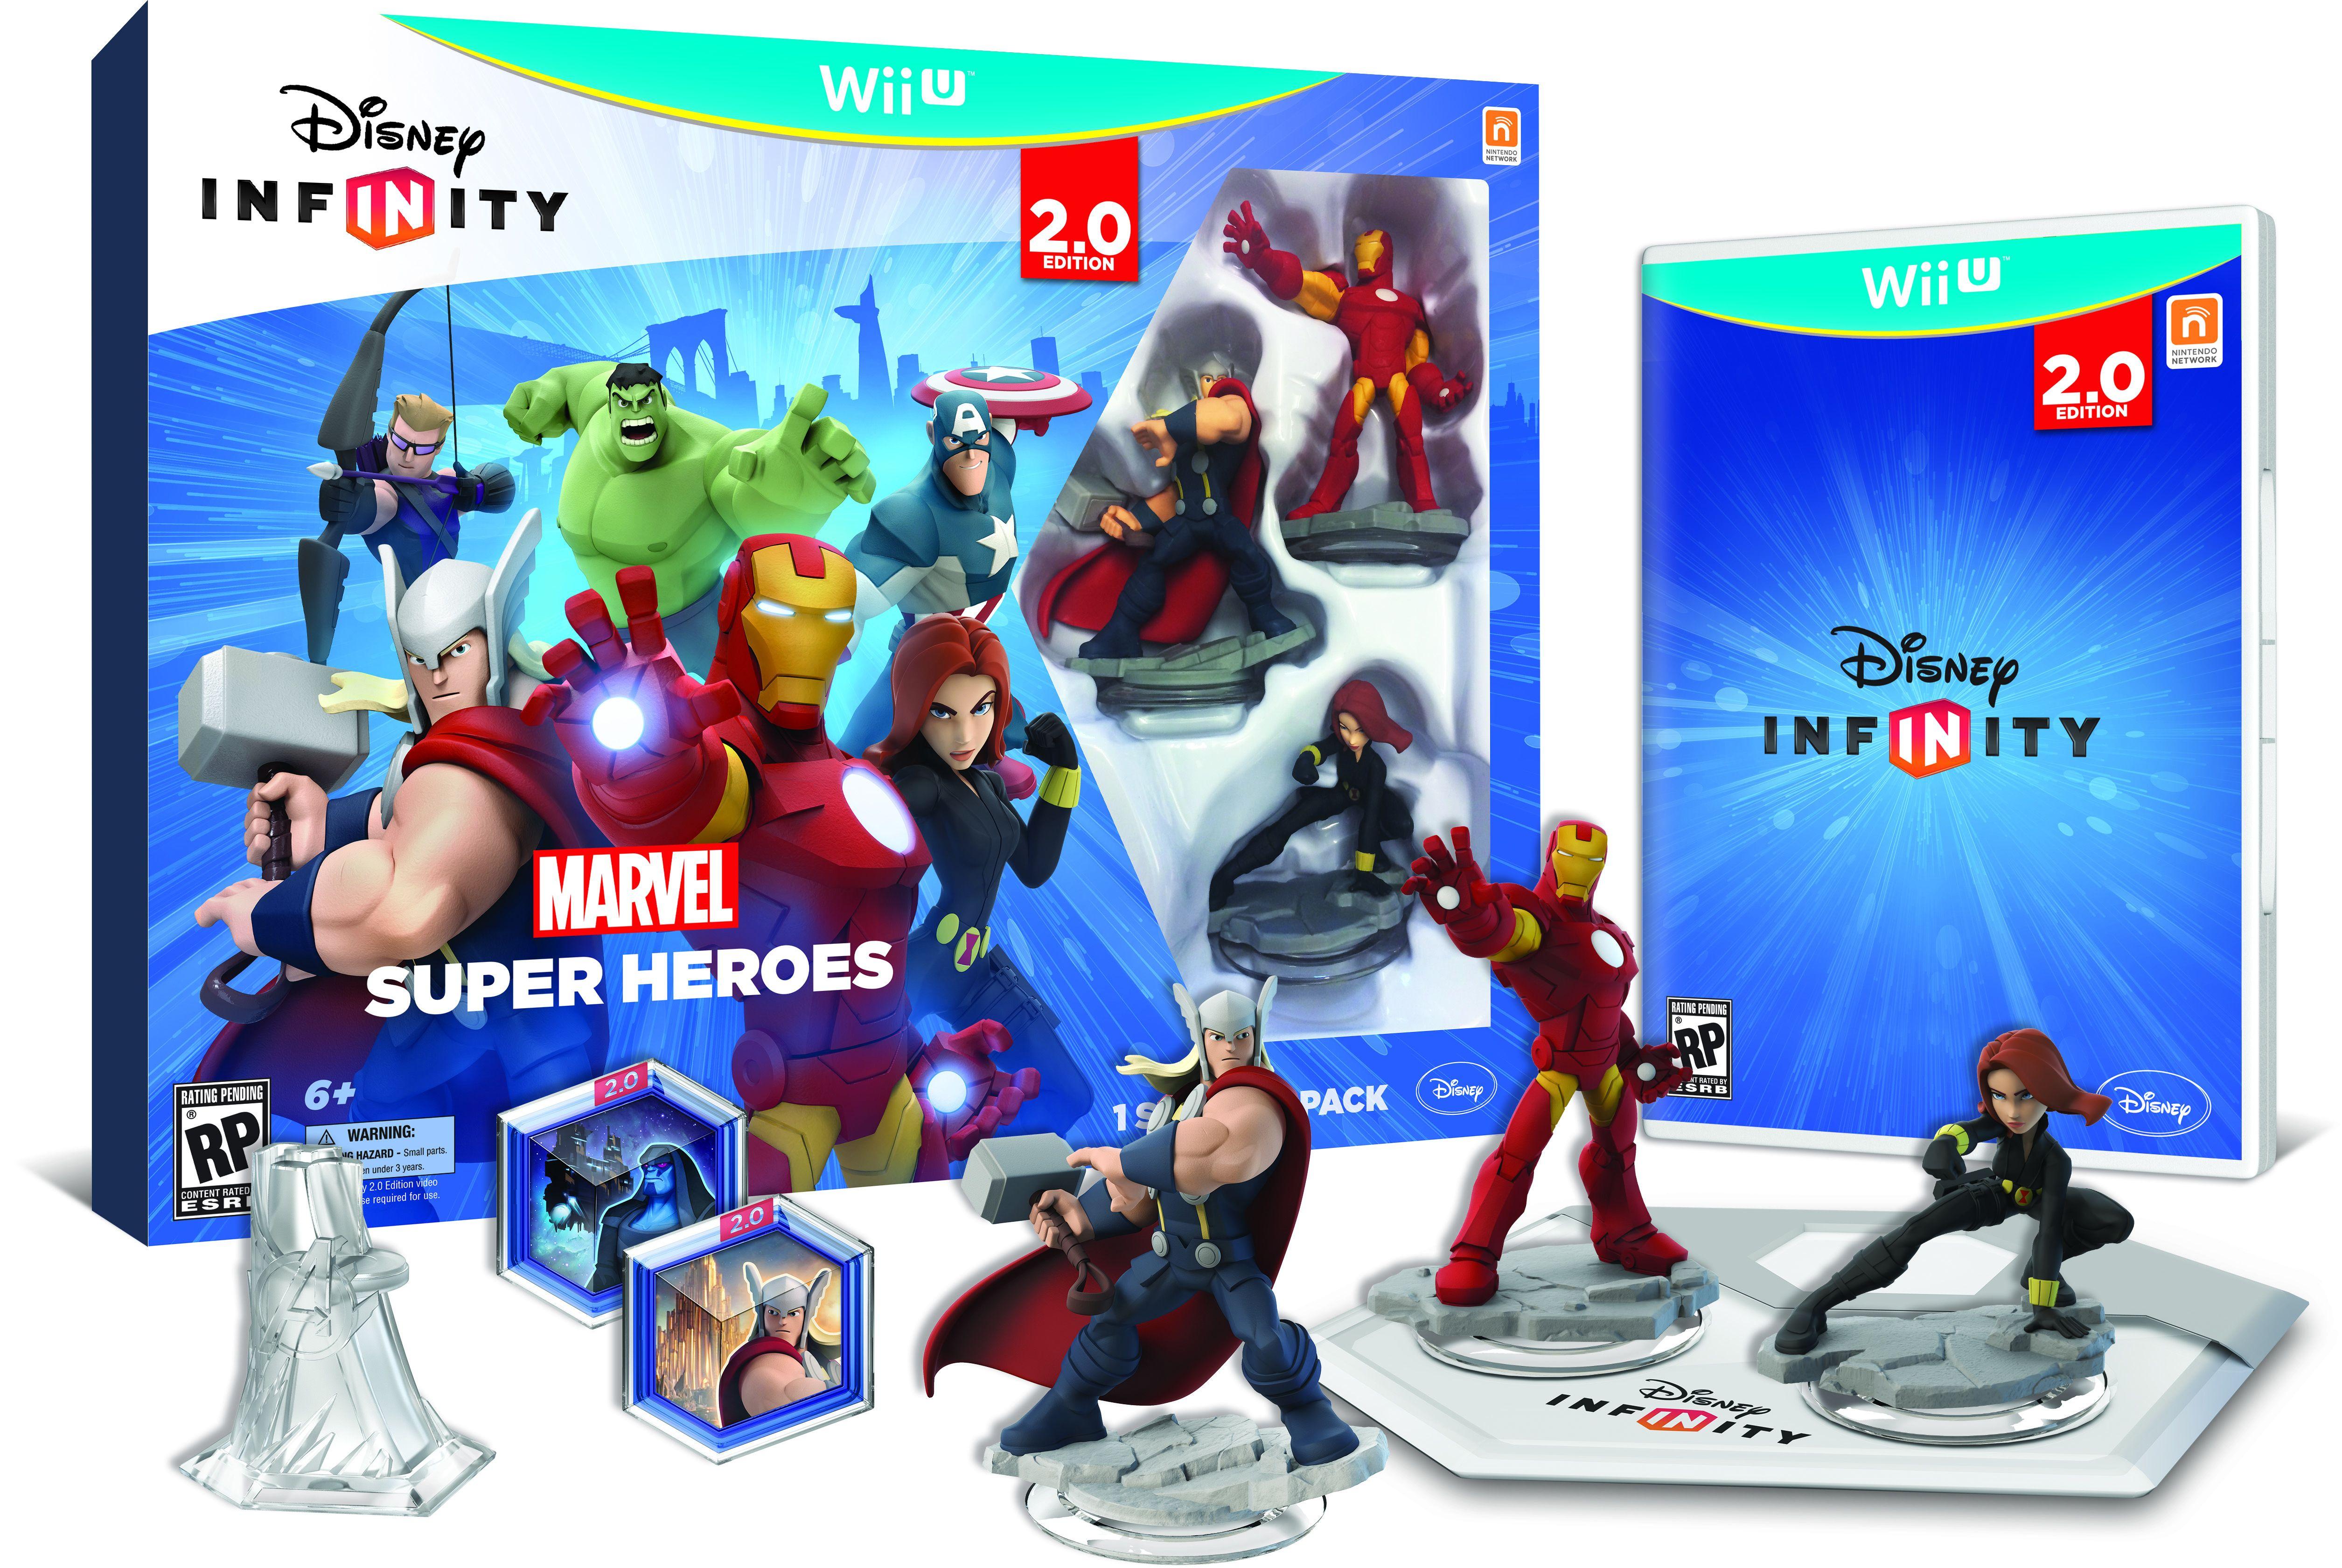 Disney Infinity 2.0: Review